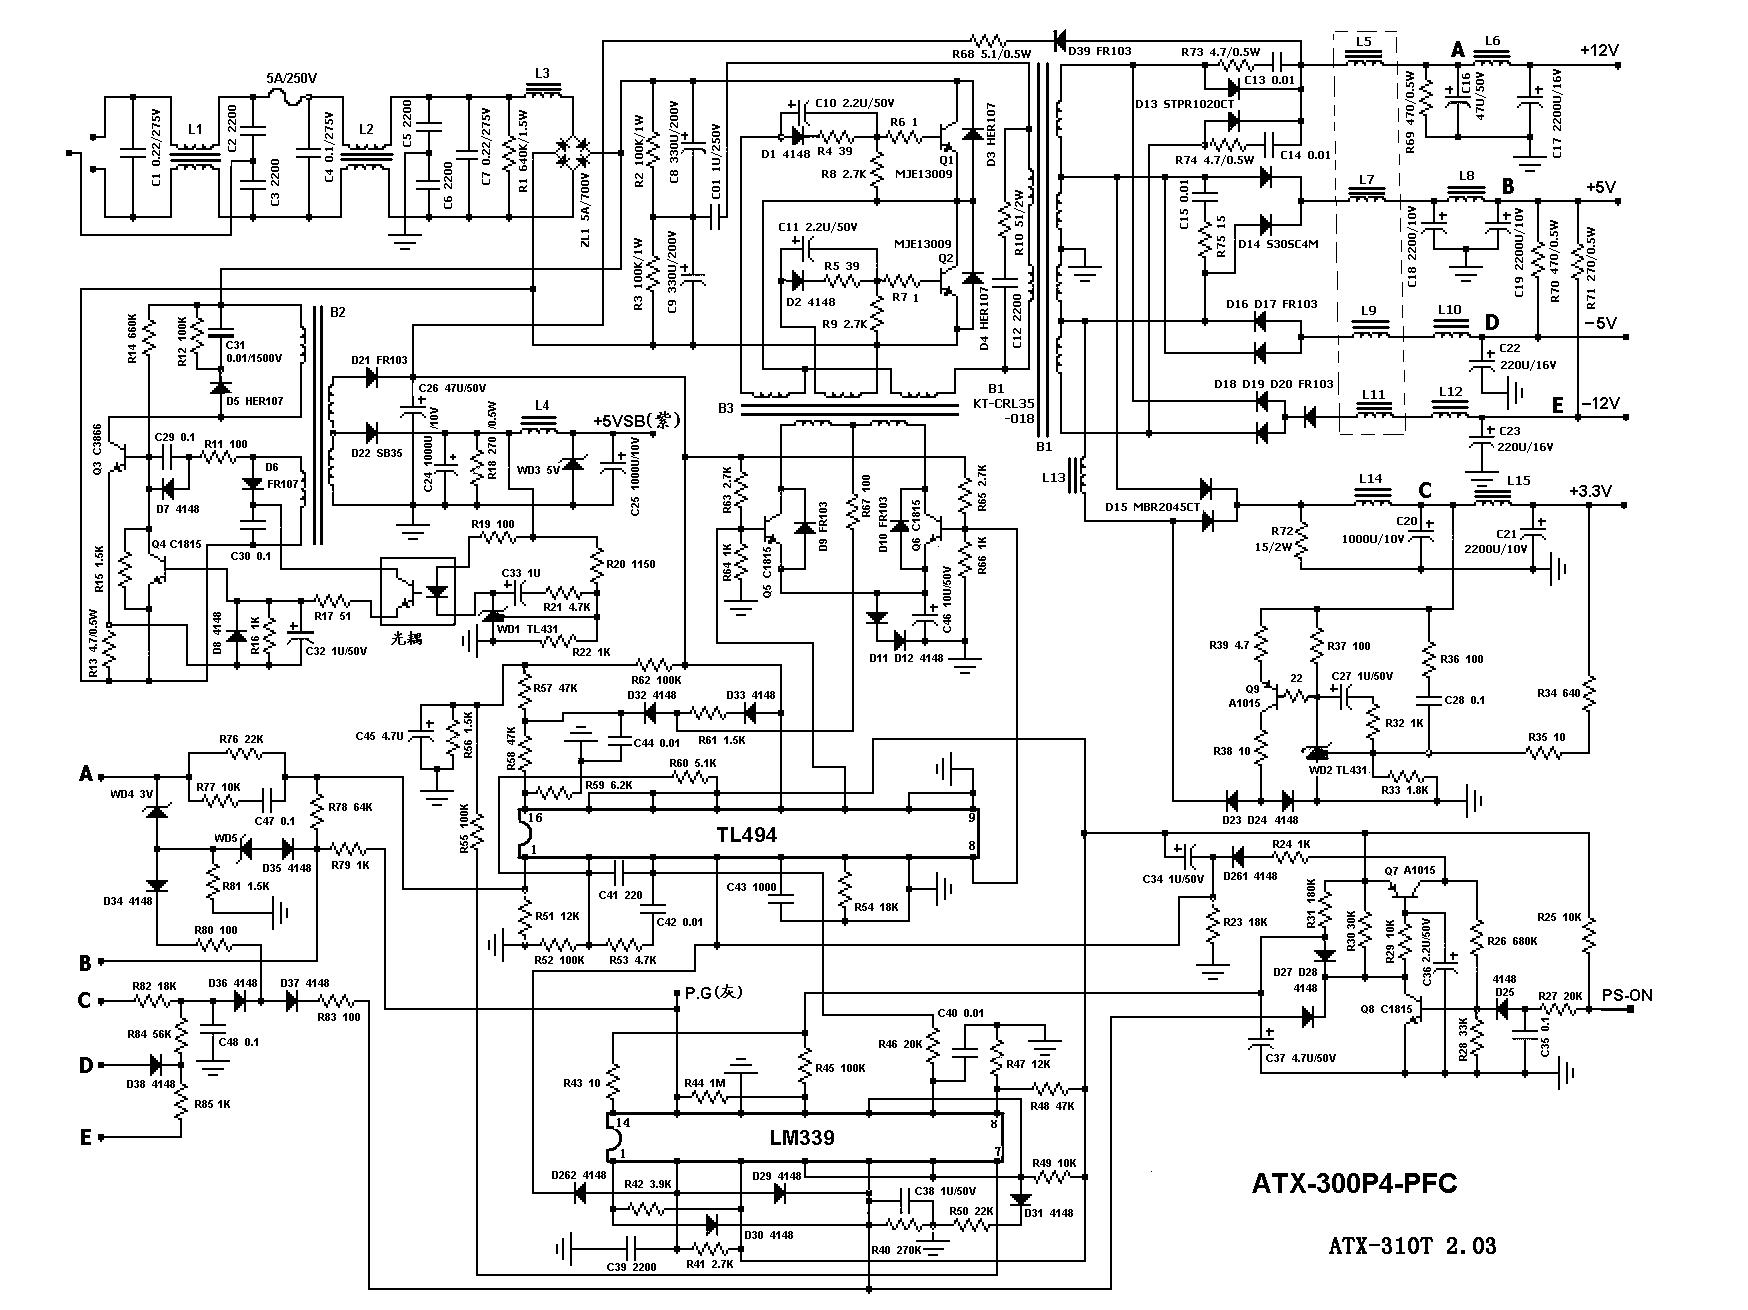 frontier atx 250f блок питания схема